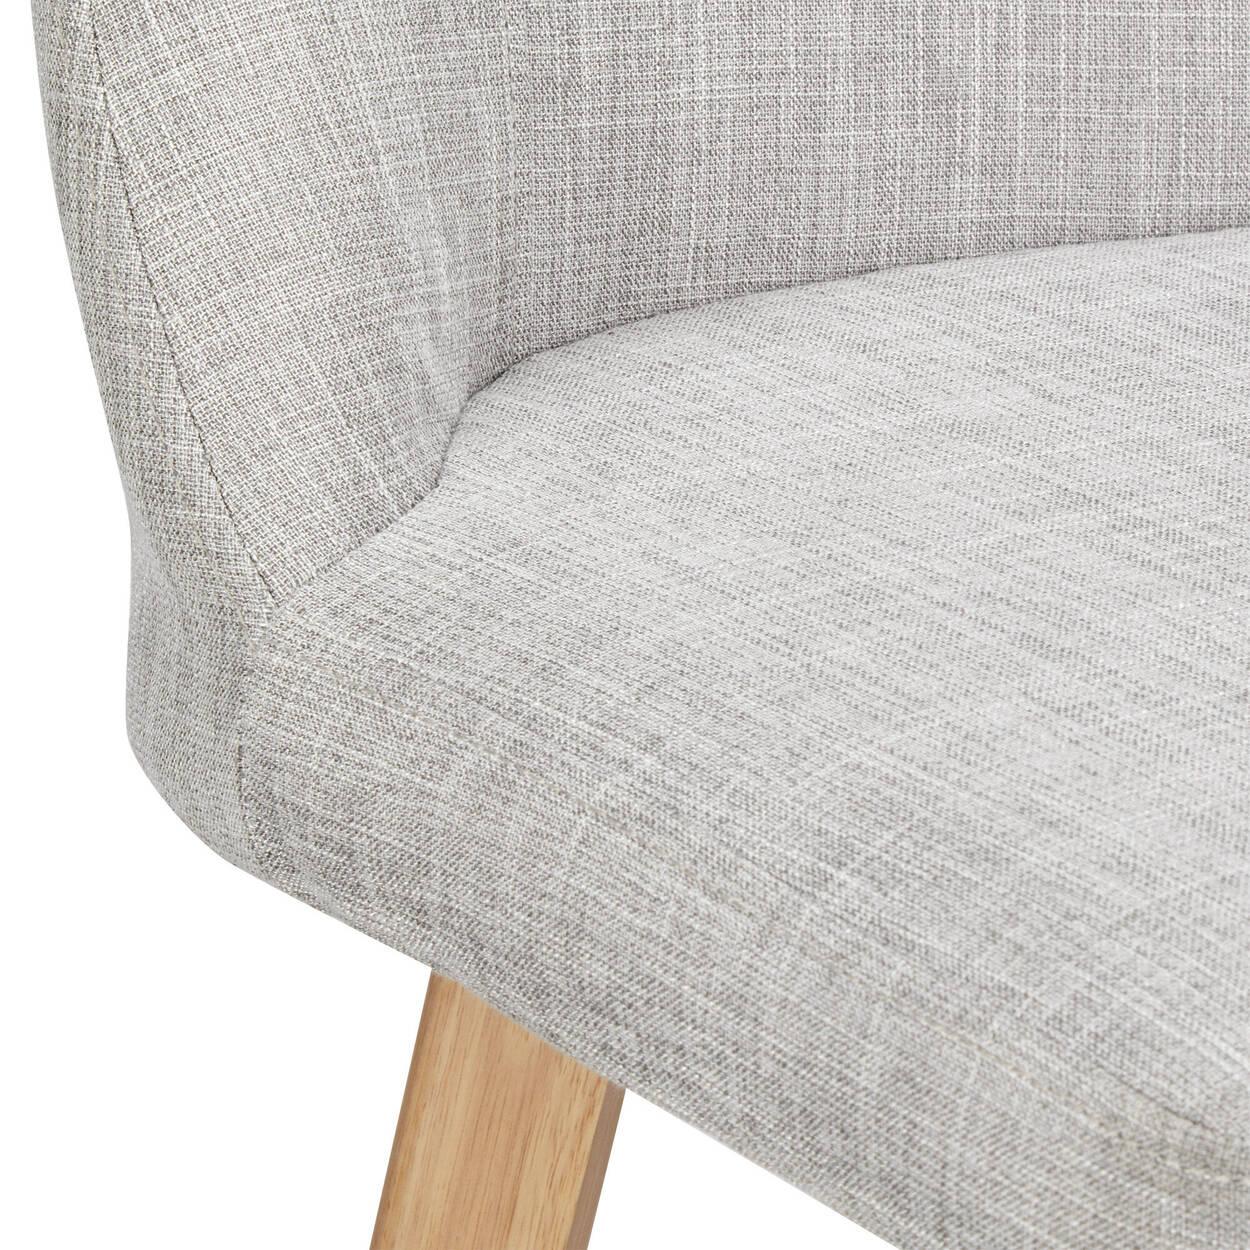 Chita Fabric and Wood Bar Stool